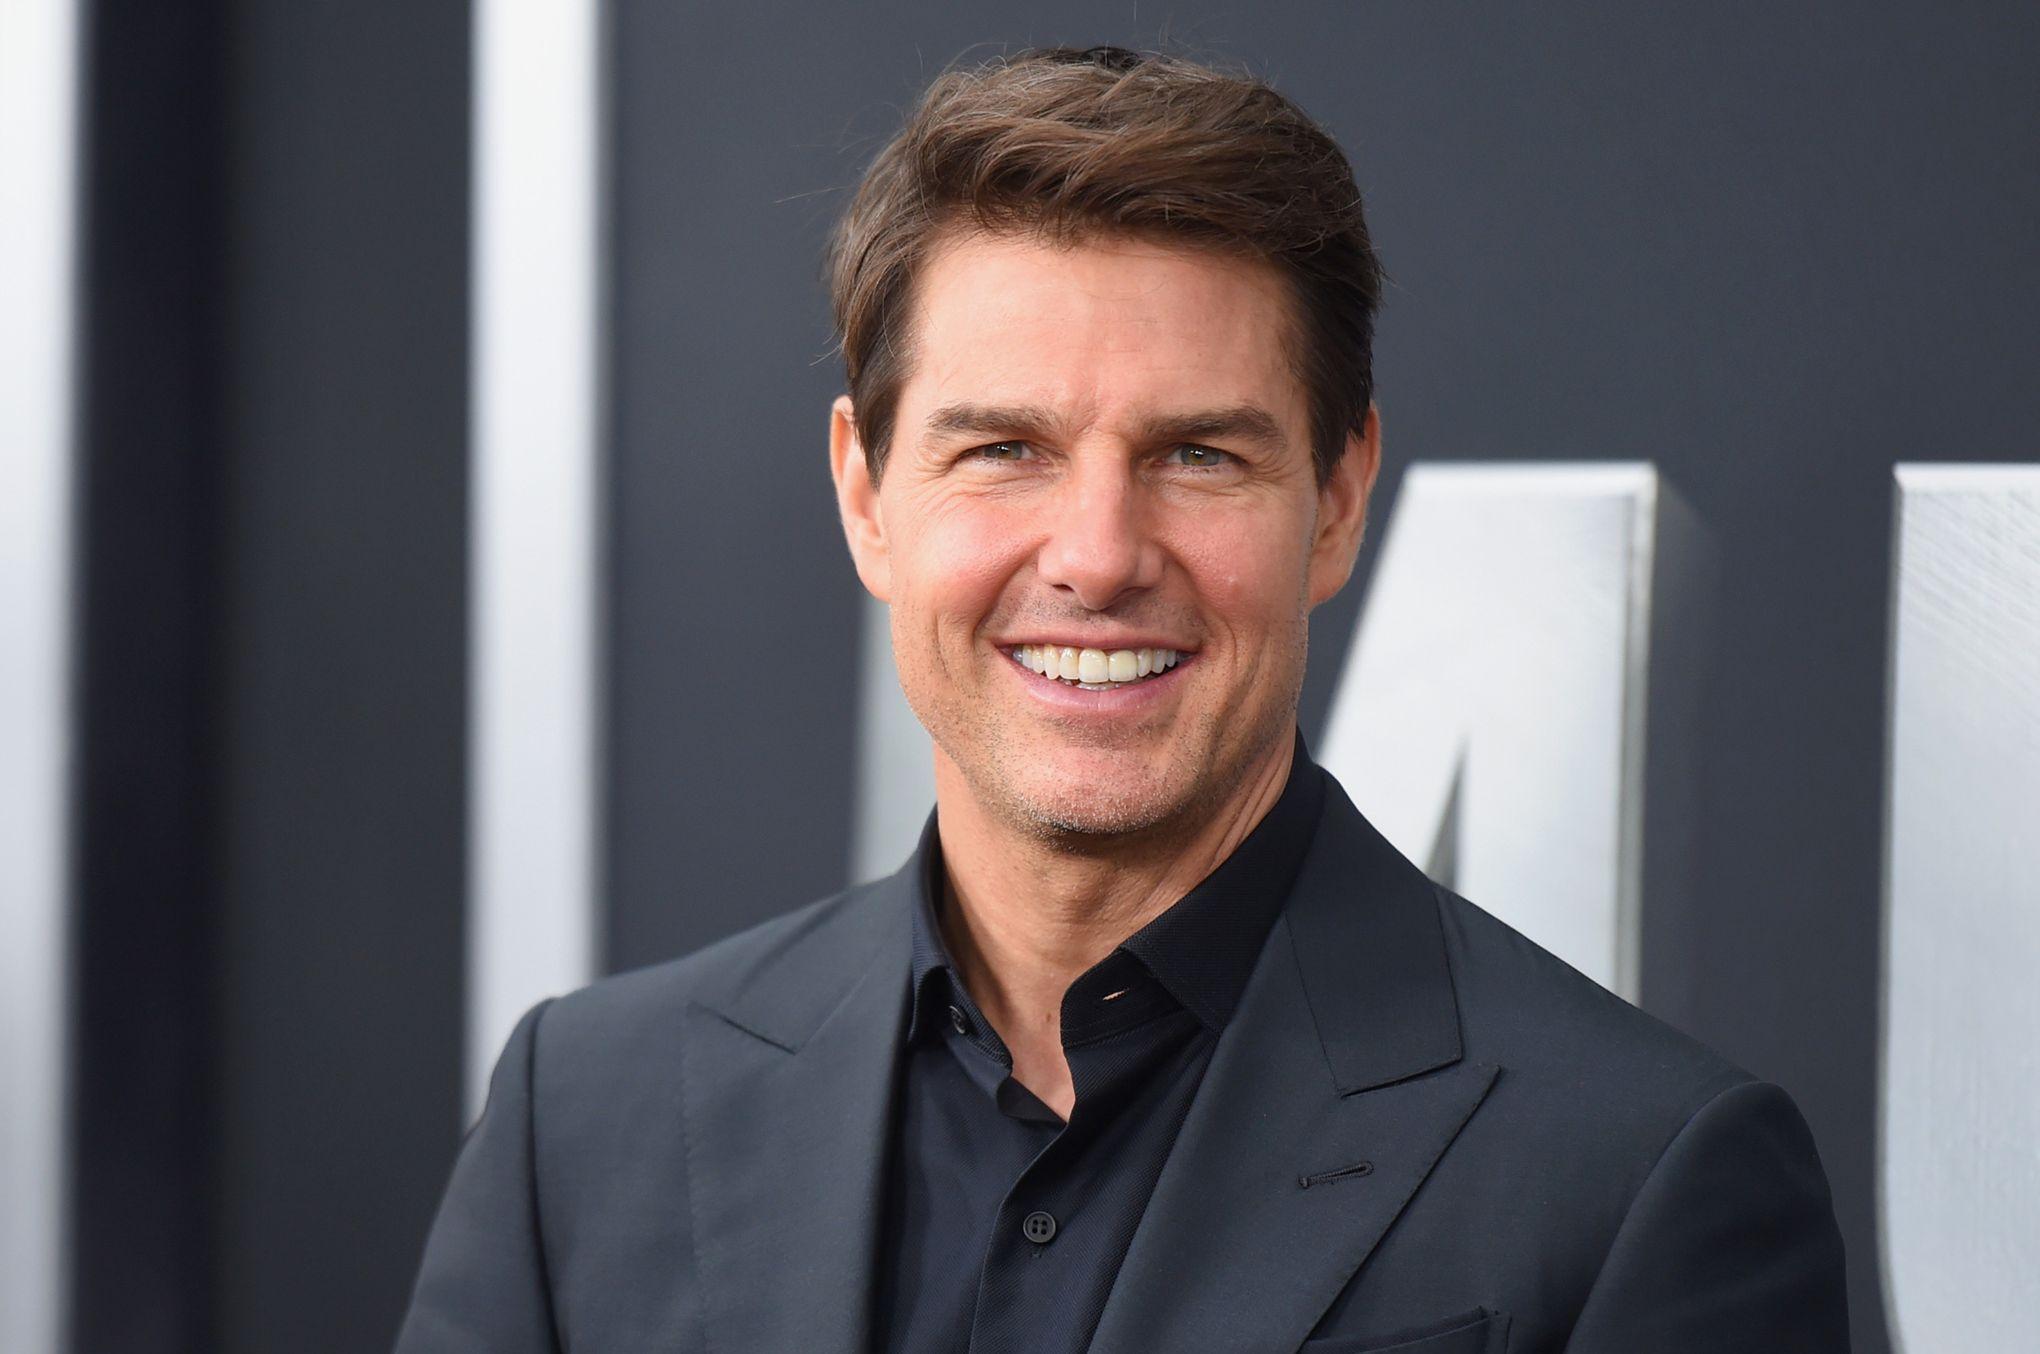 Tom Cruise est «diabolique» selon l